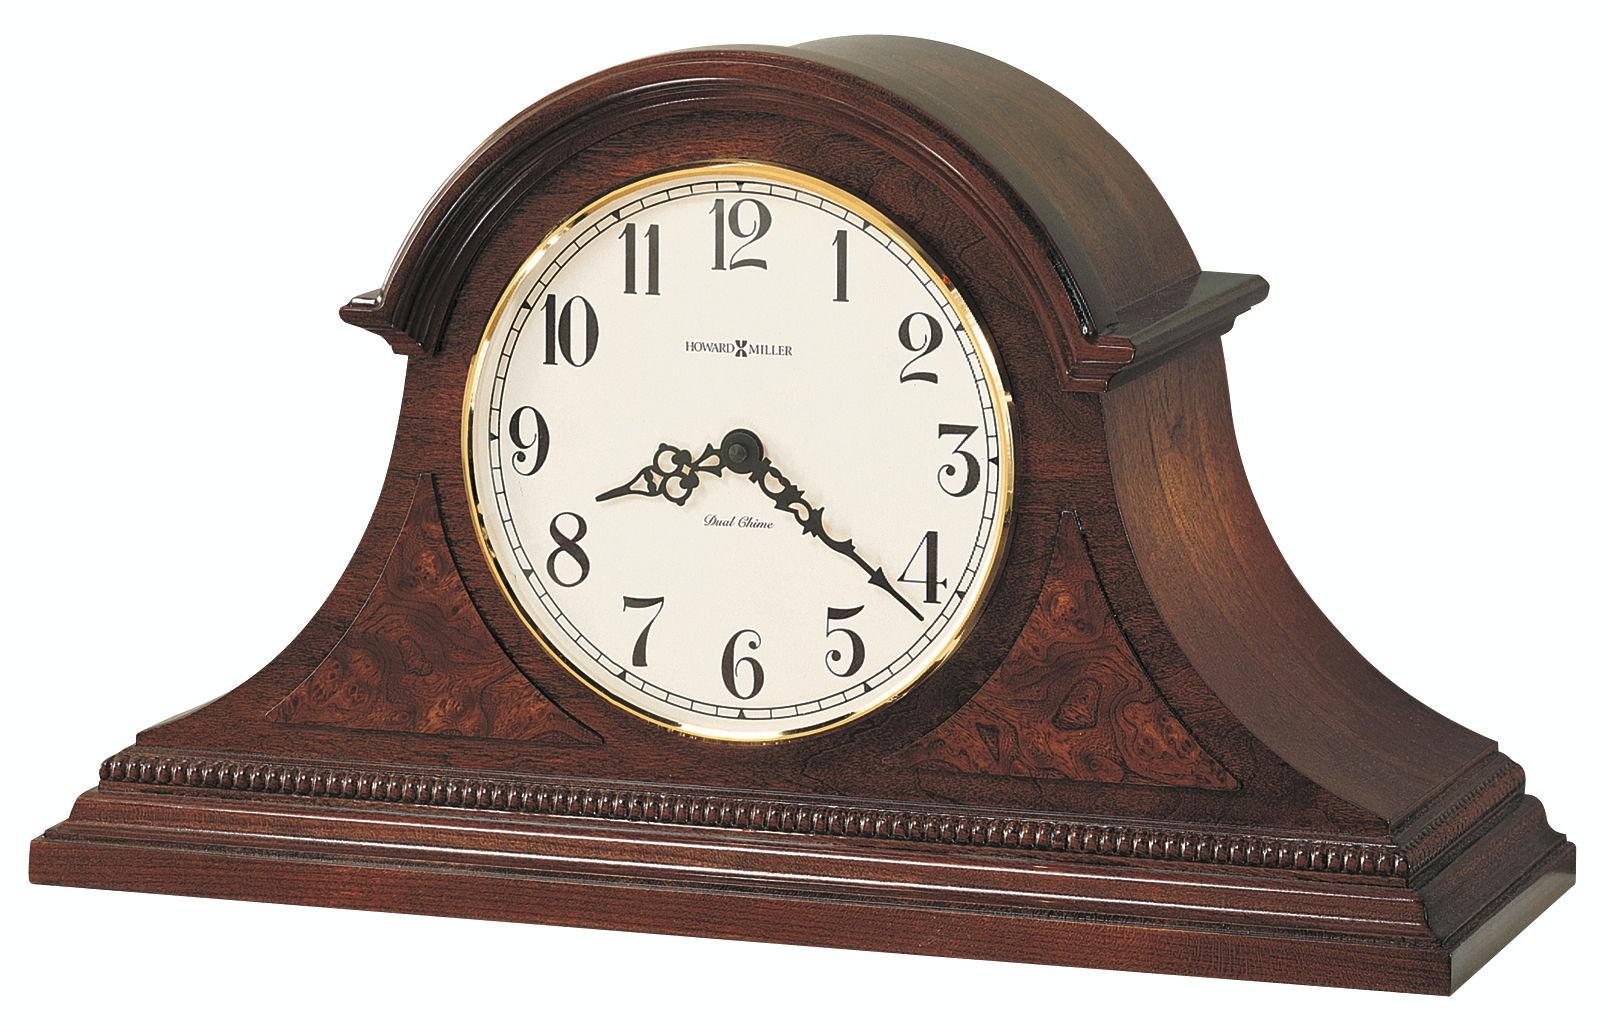 Howard Miller Fleetwood Mantel Clock 630122 From Walter E. Smithe Furniture  + Design